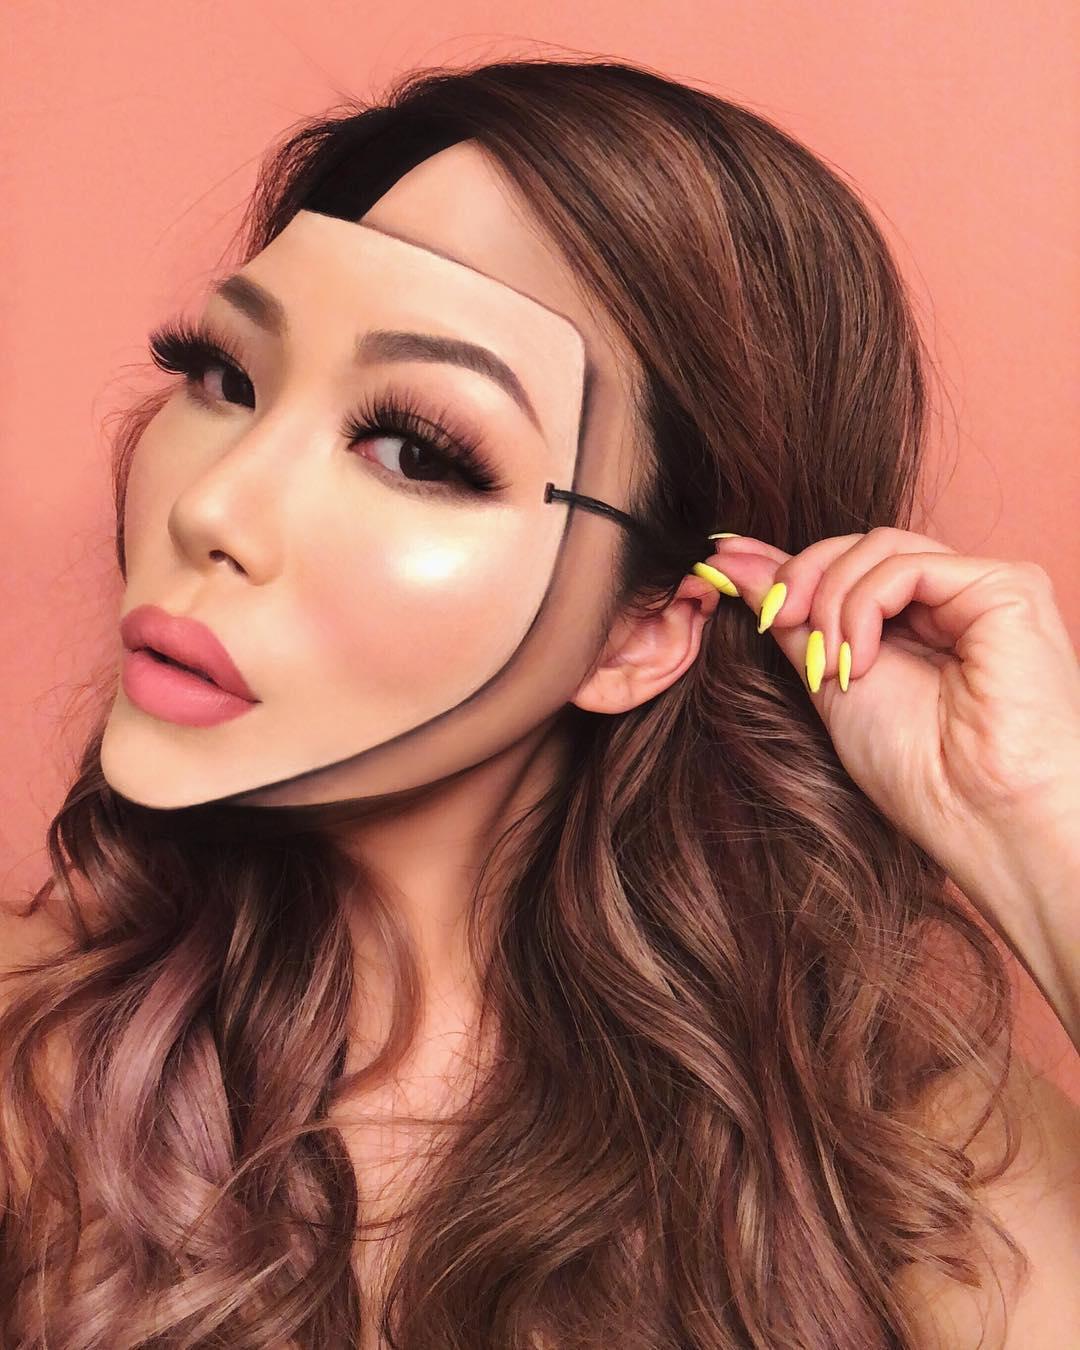 Mimi choi maquillaje ilusion optica (11)